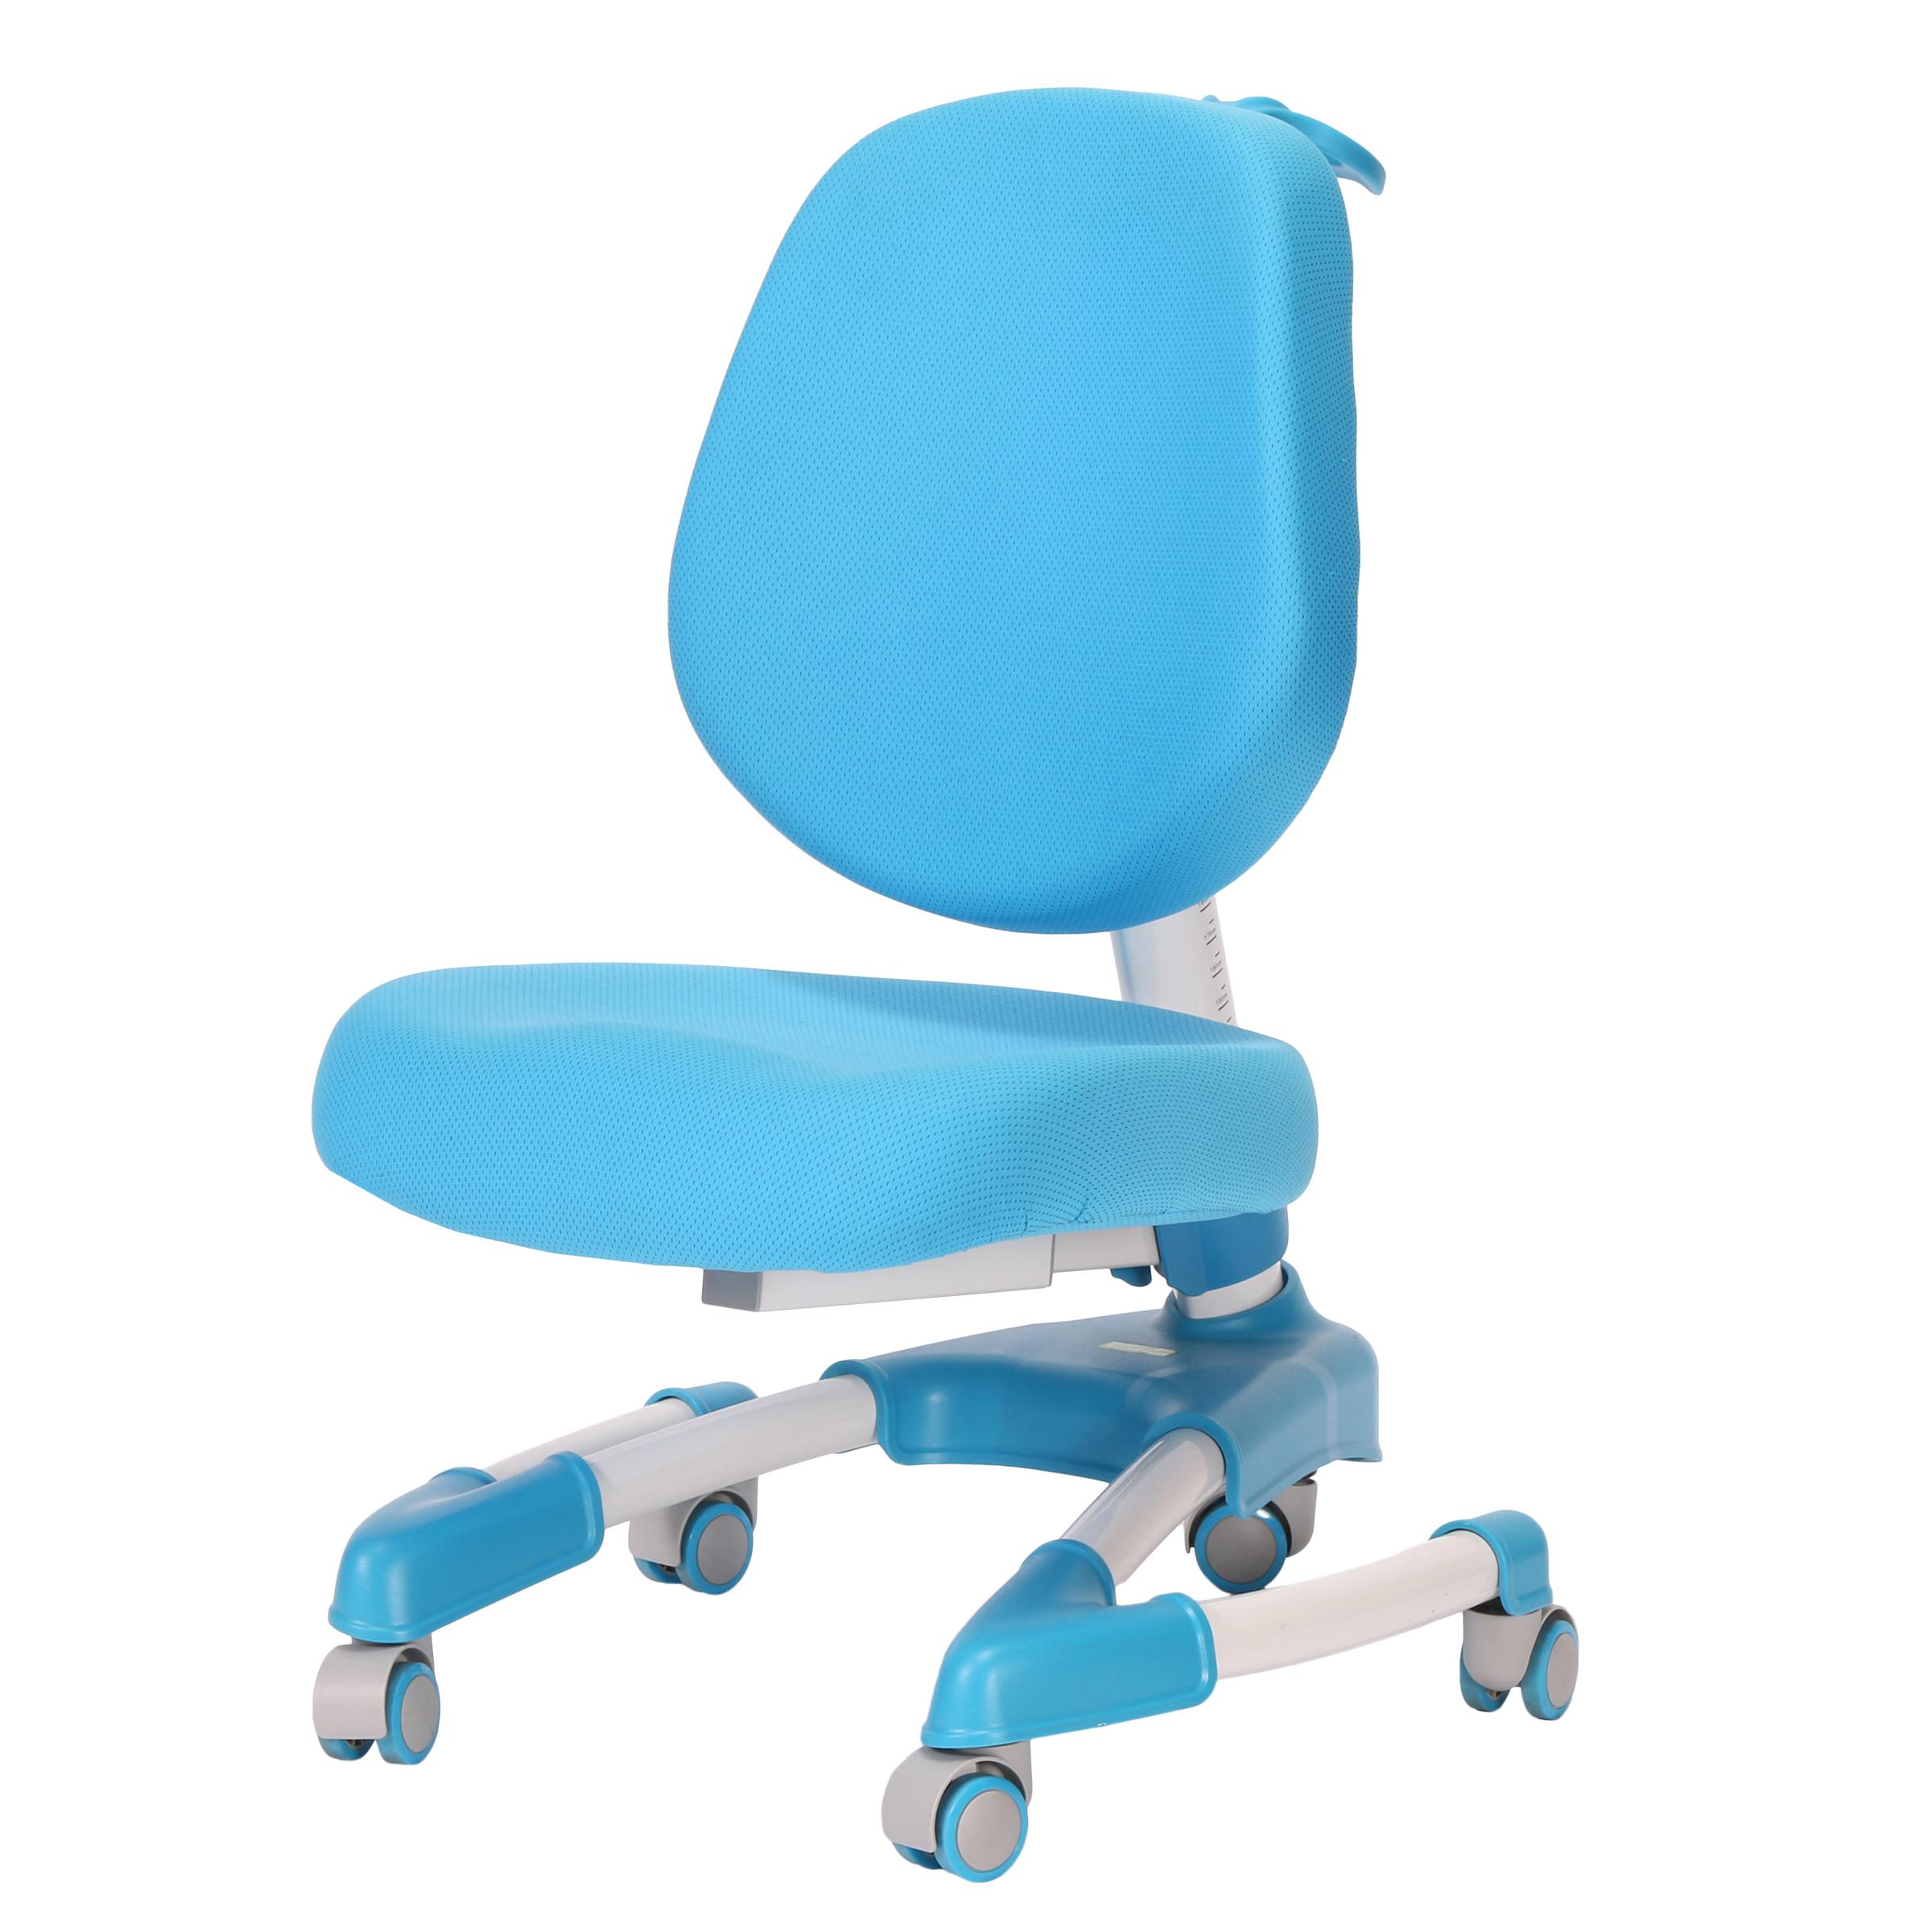 fundesk Детское кресло Buono Blue, Fundesk (Buono Blue)